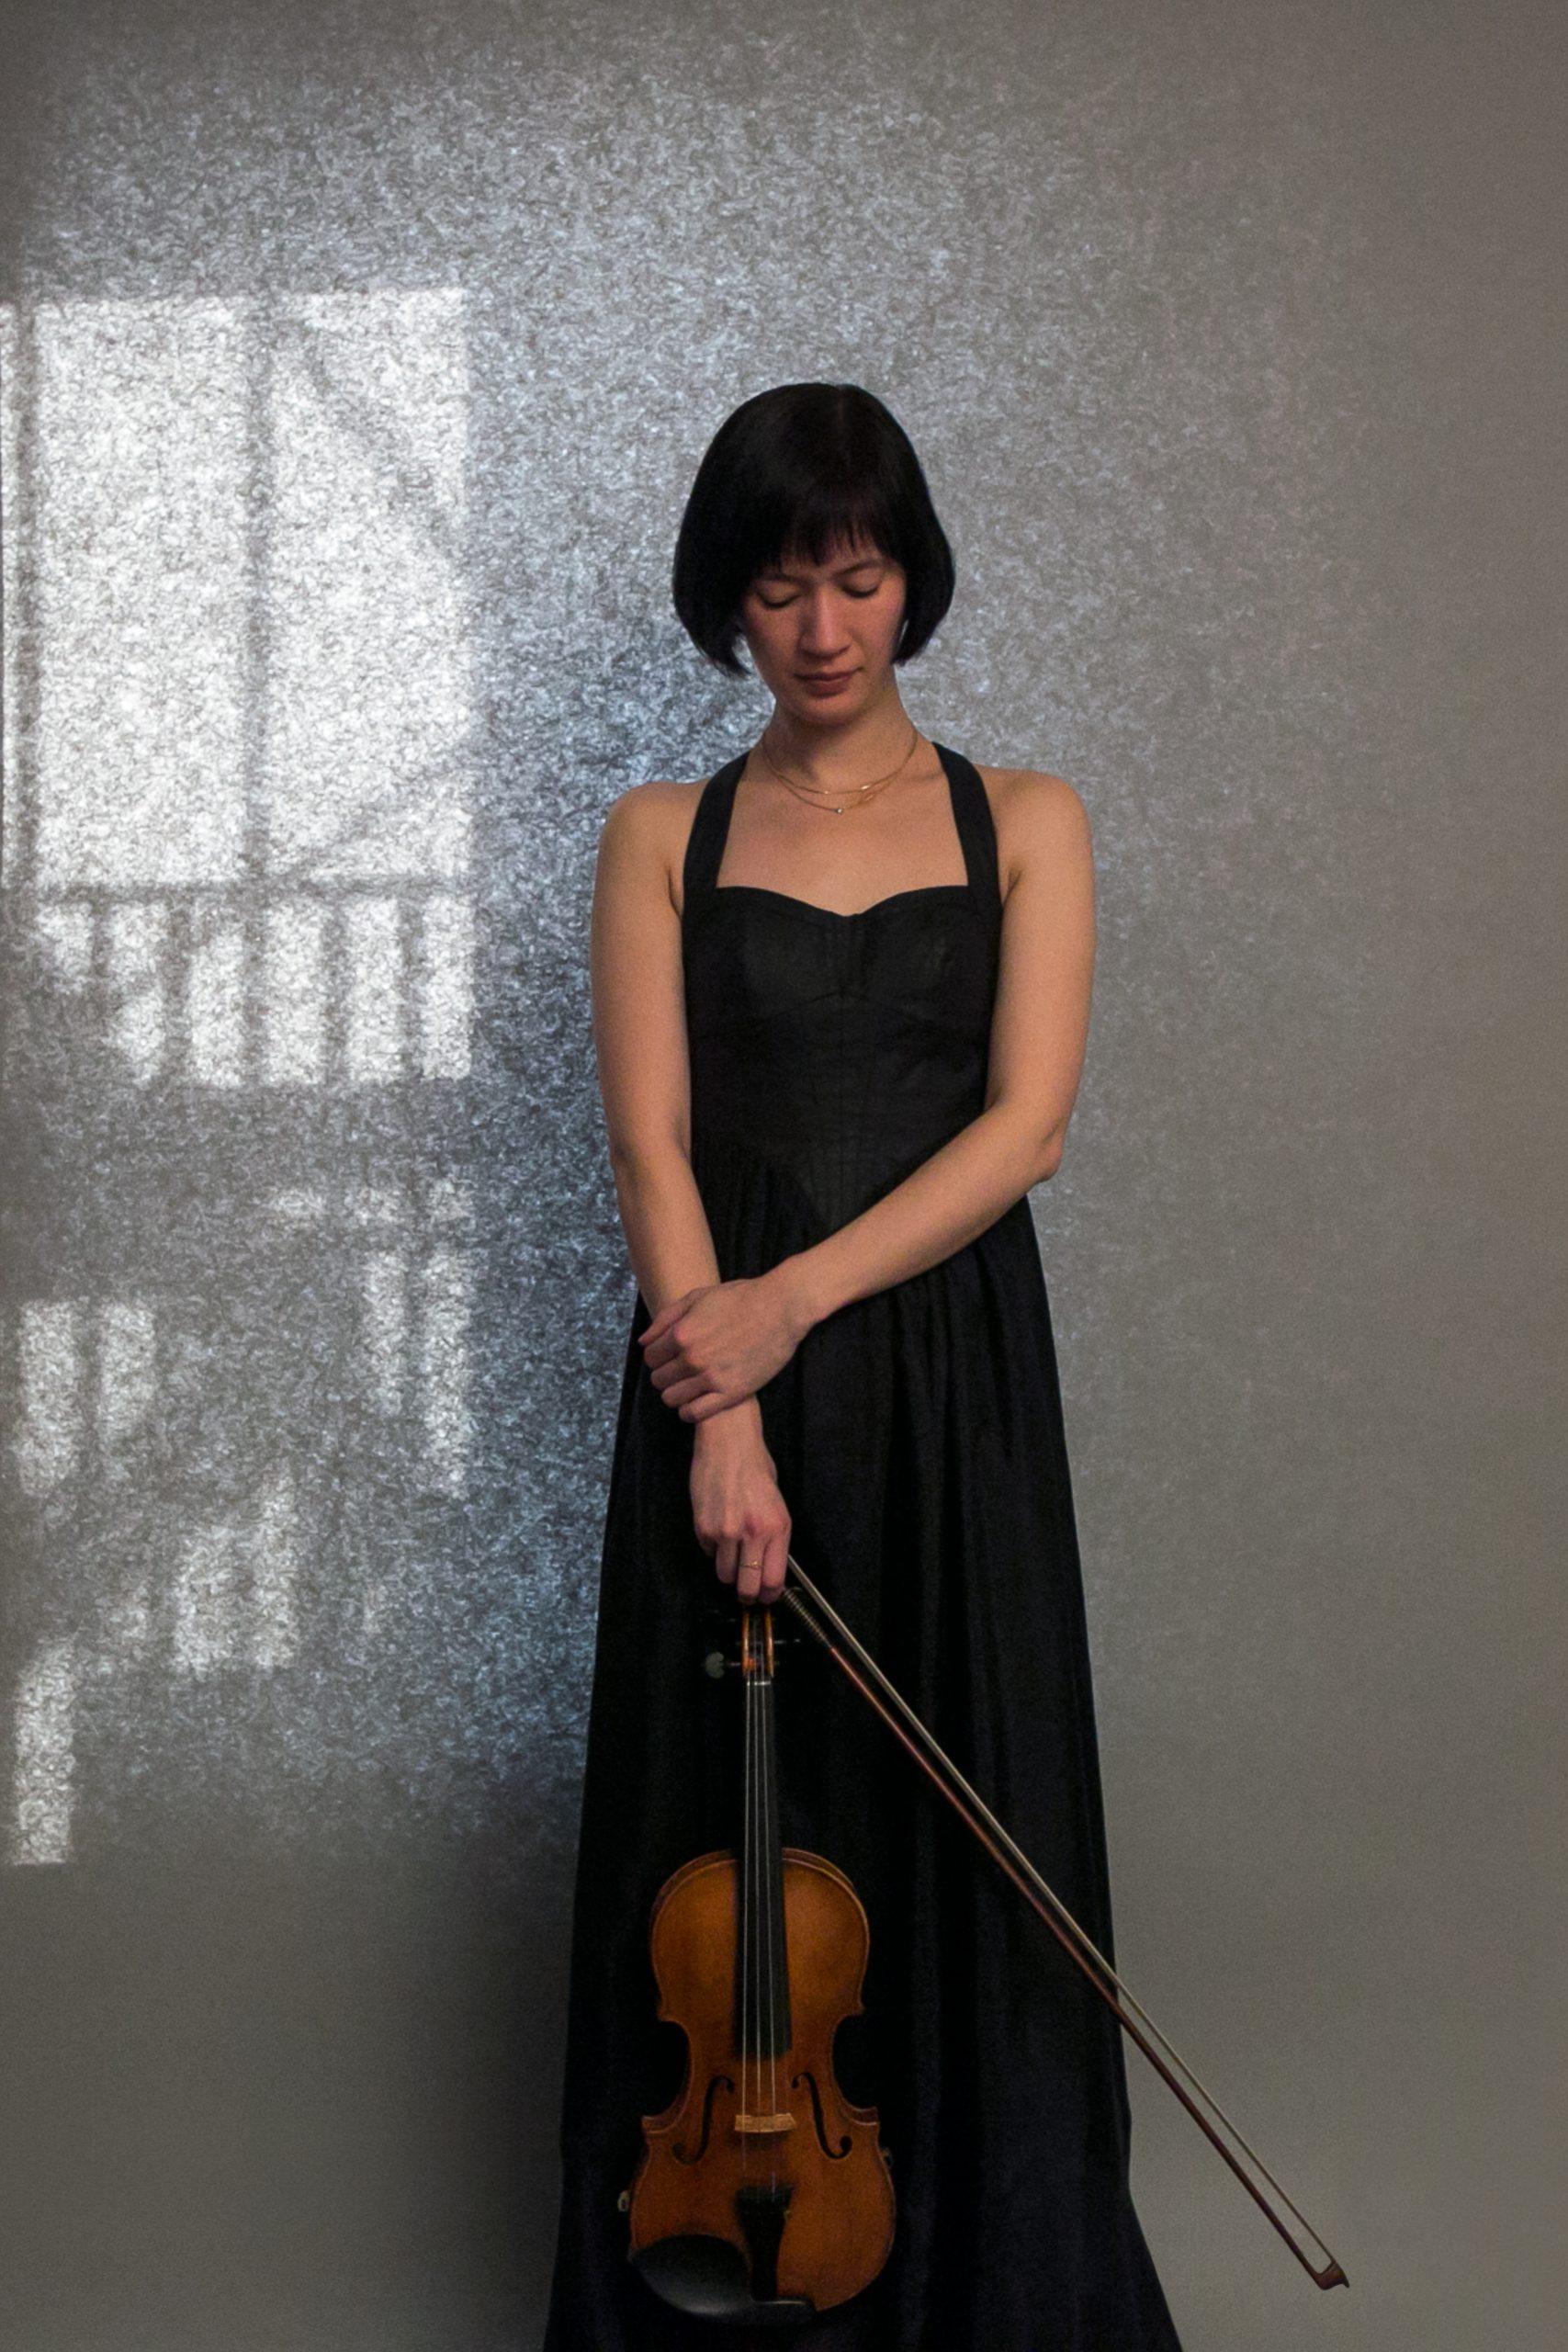 Miranda Cuckson performs solo at Fullerton Hall on Sunday.